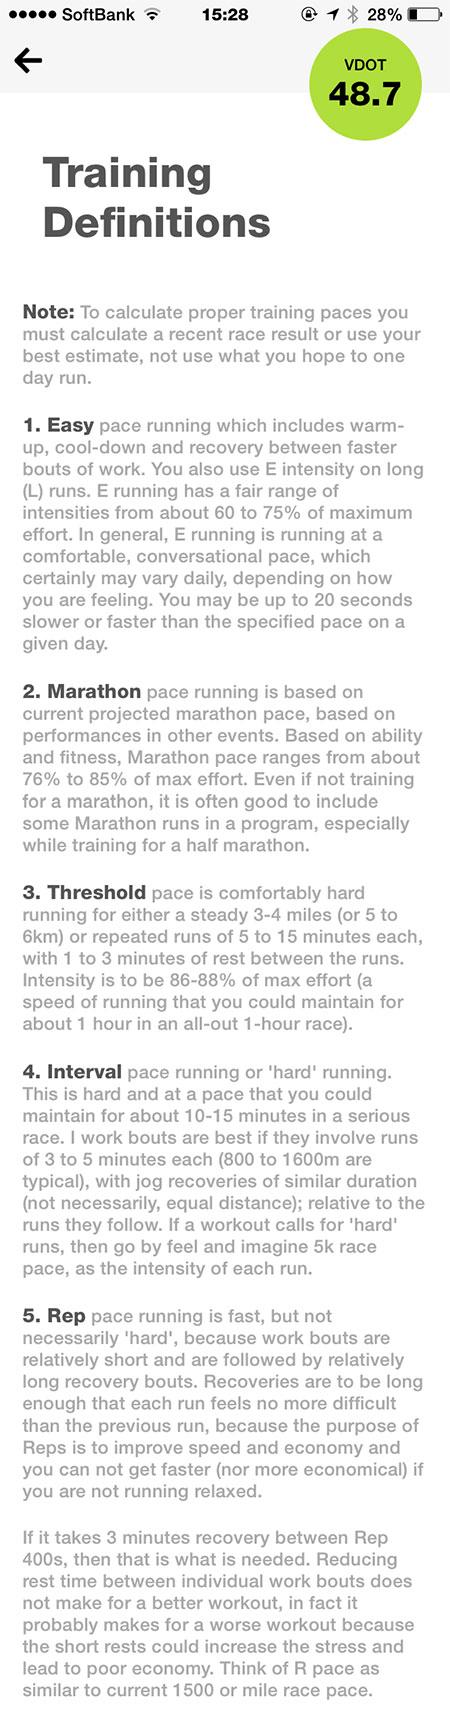 Trainingページに表示された各項目の説明